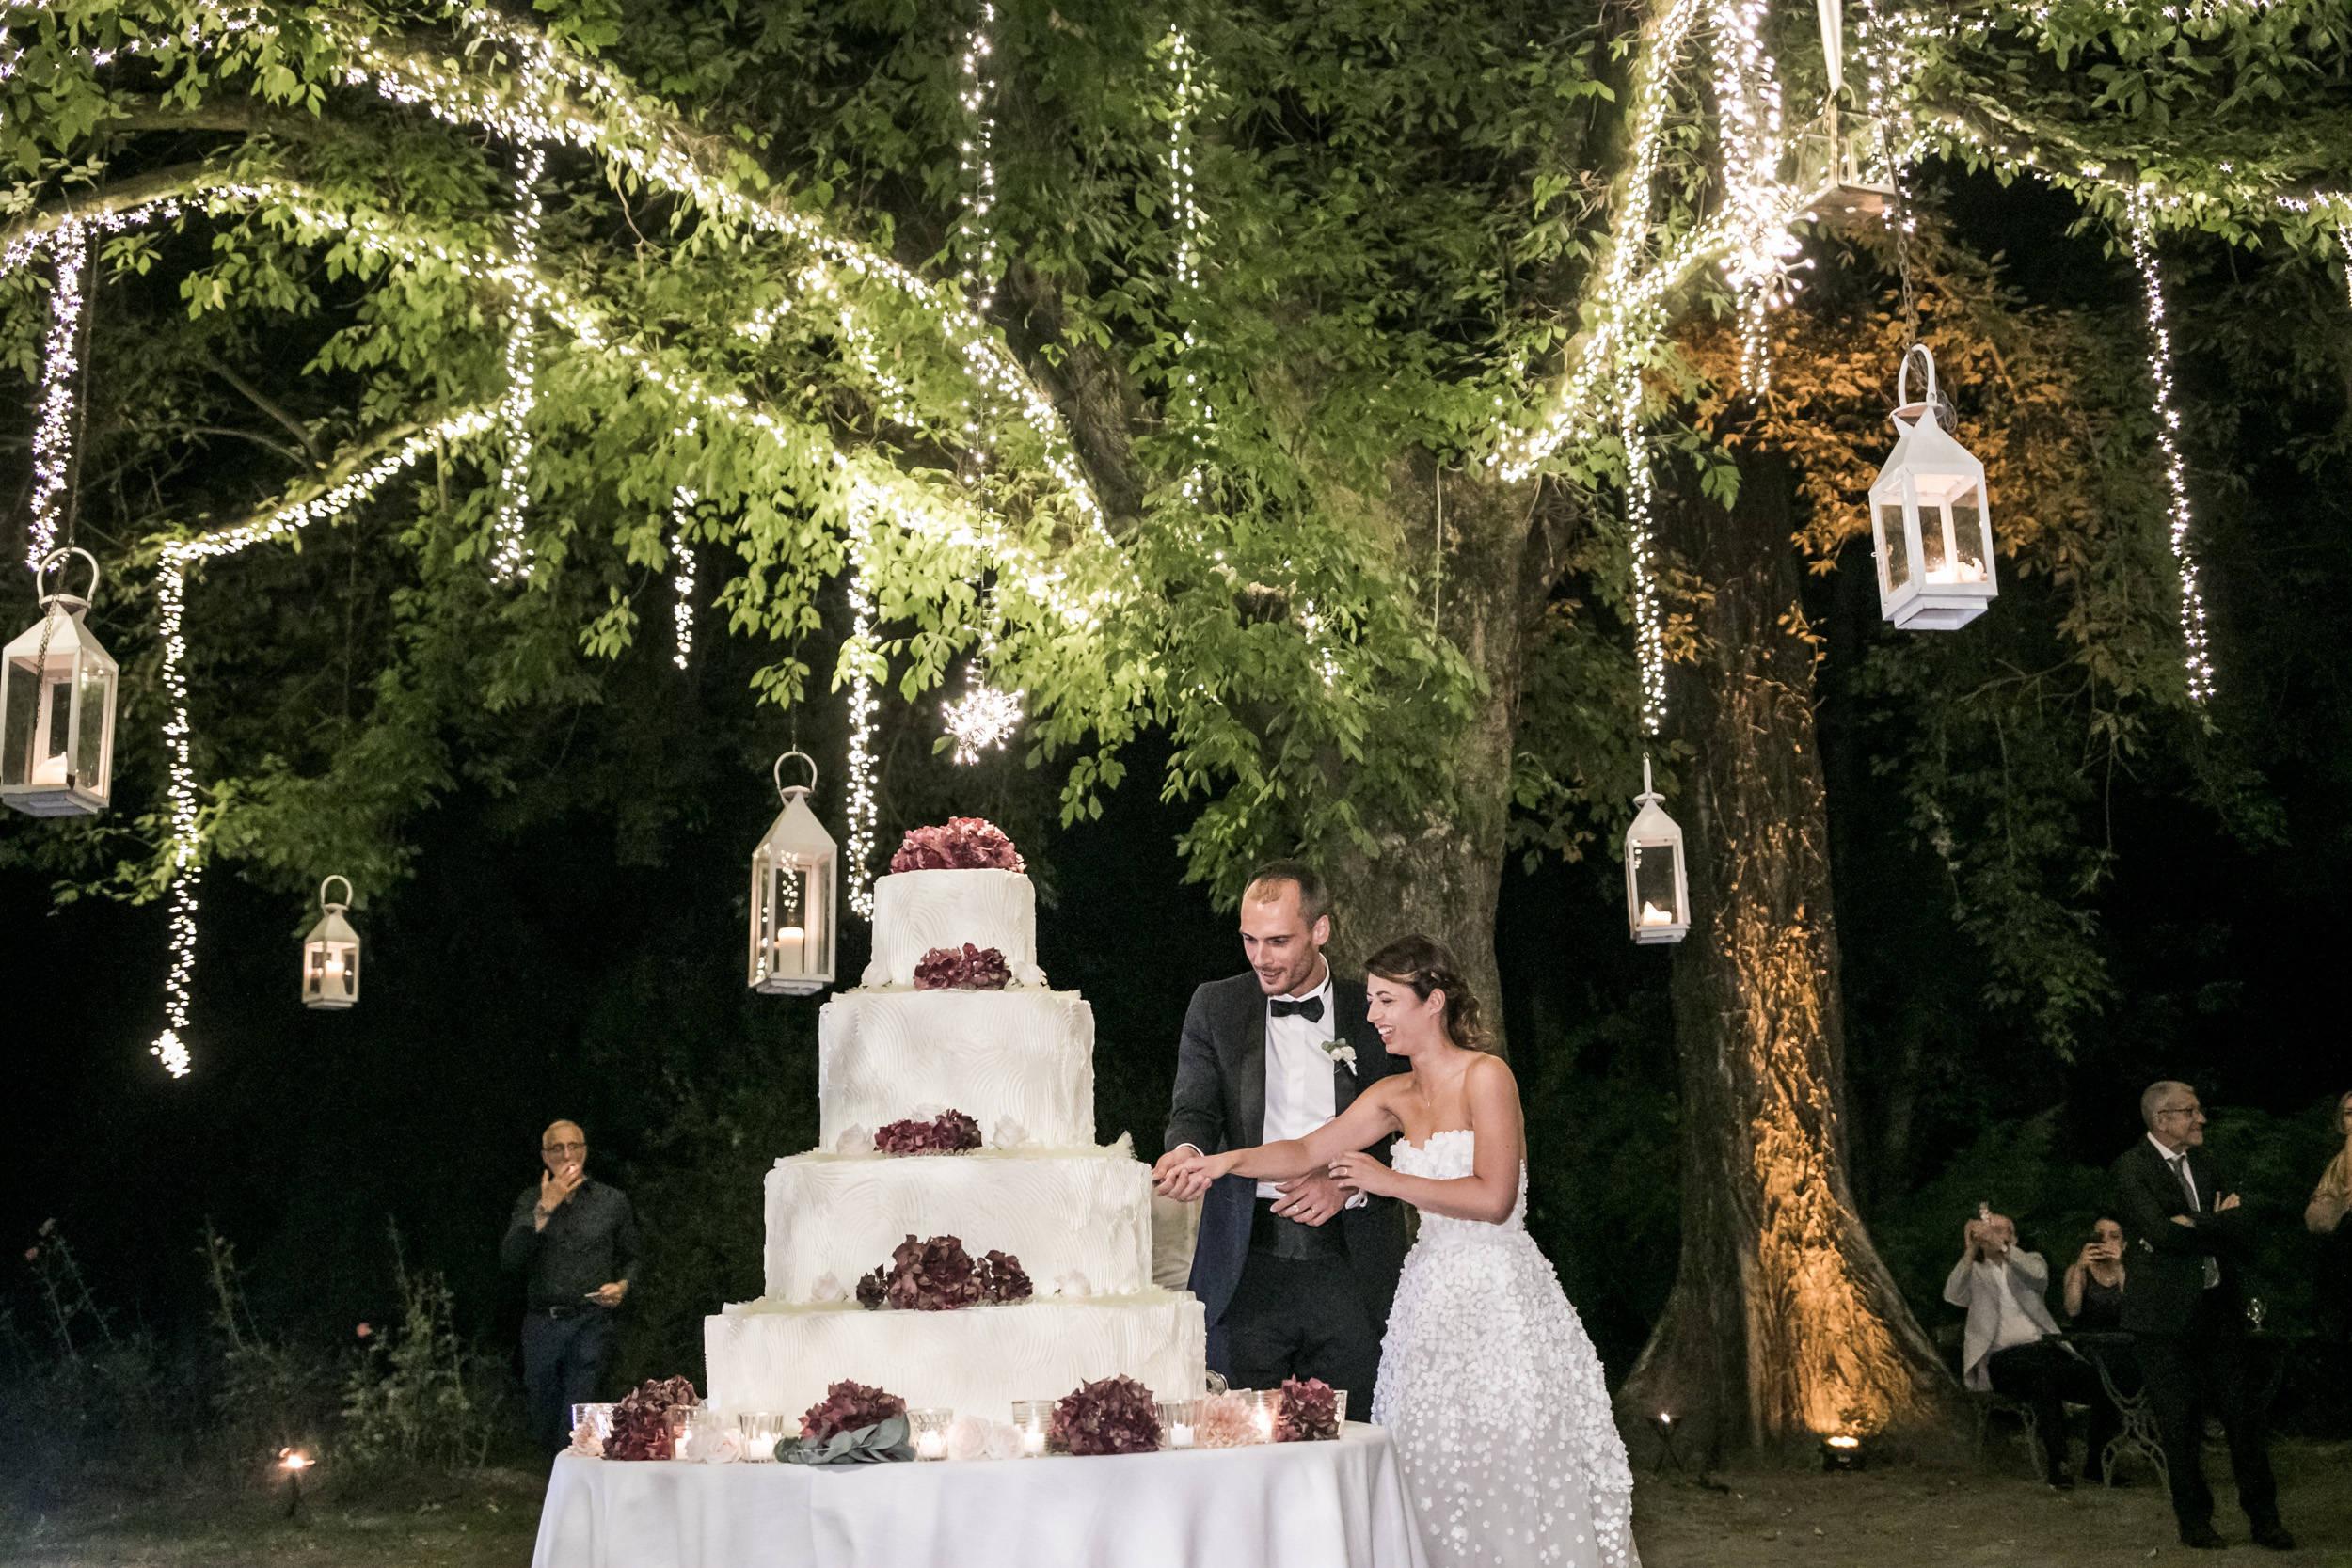 matrimonio_villa-ferrari-gussola_MI-107